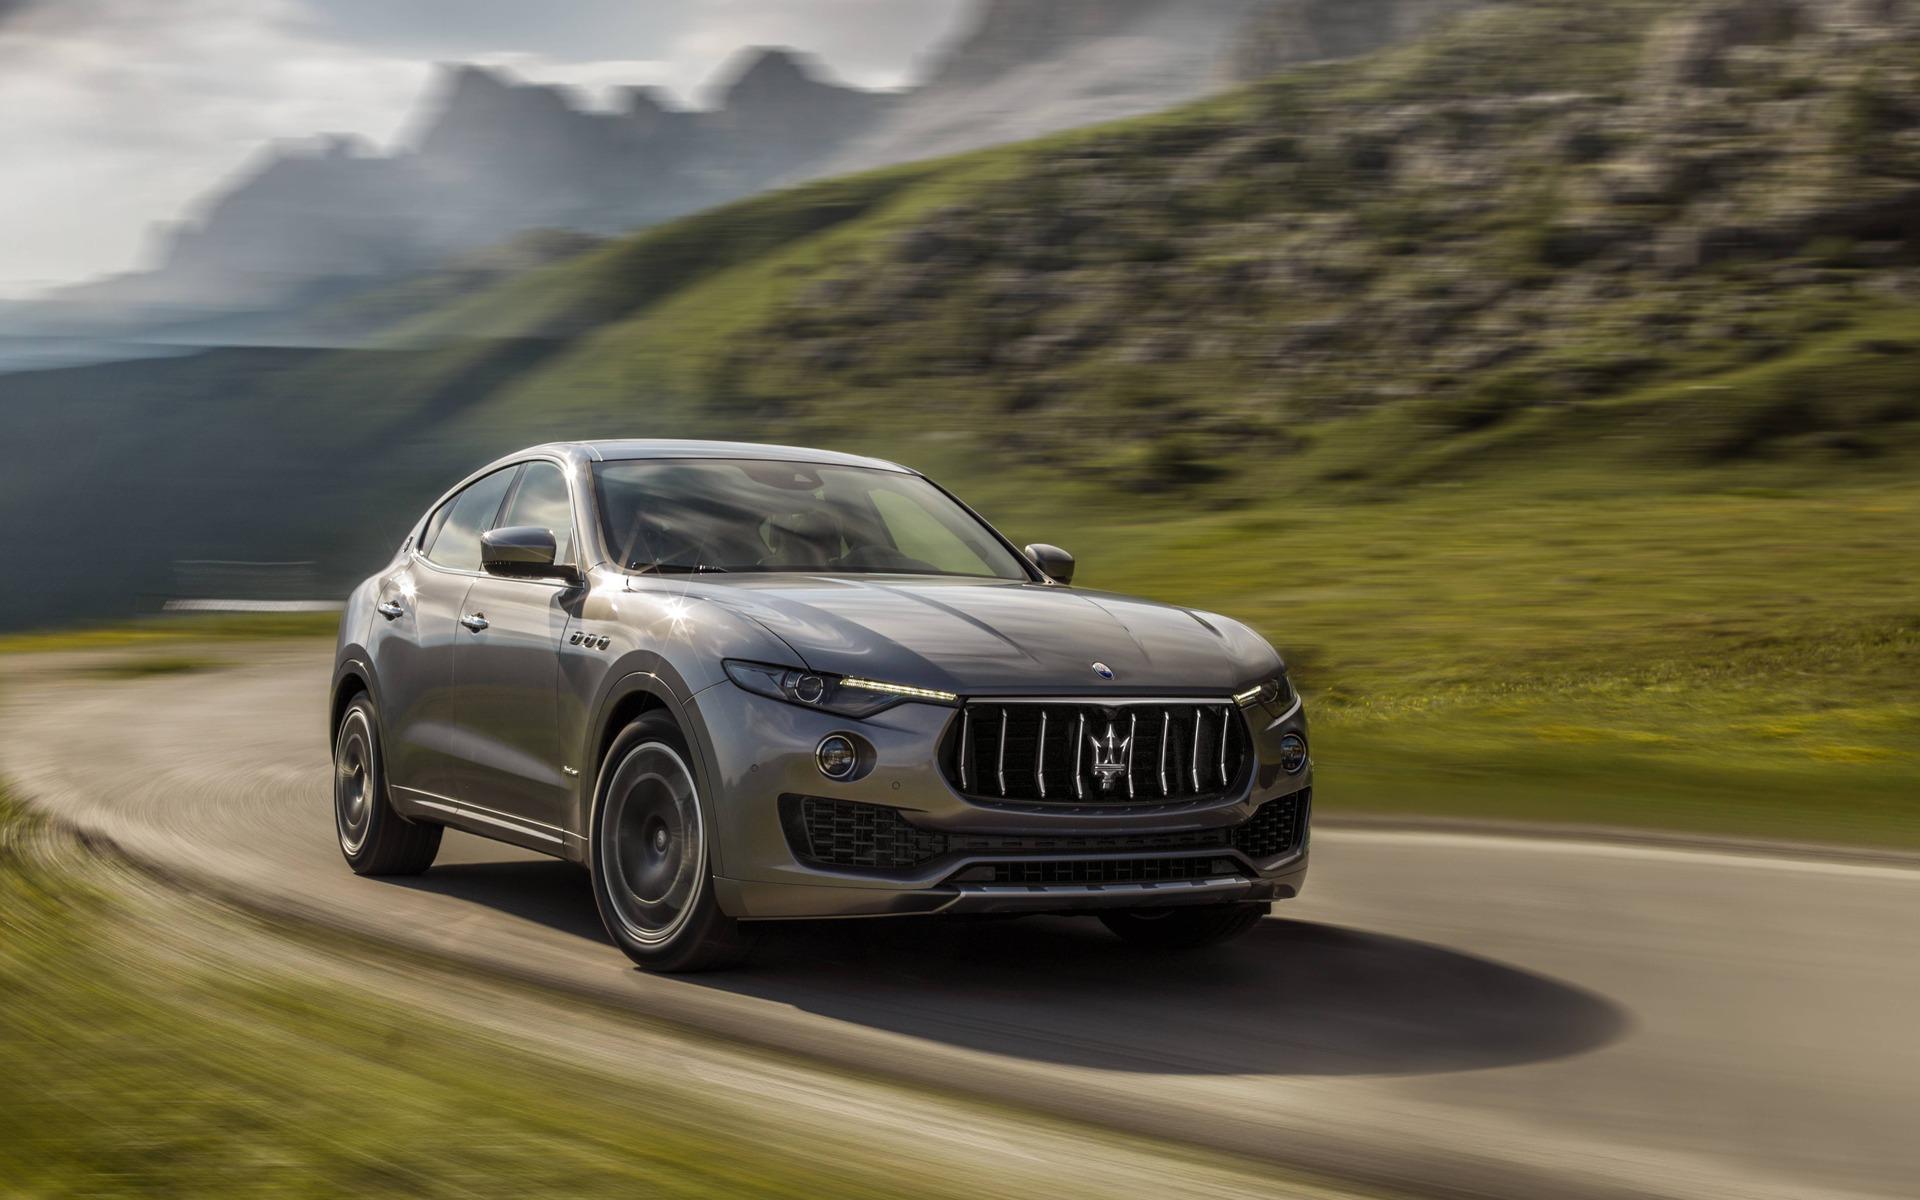 Improvements For The 2018 Maserati Levante The Car Guide